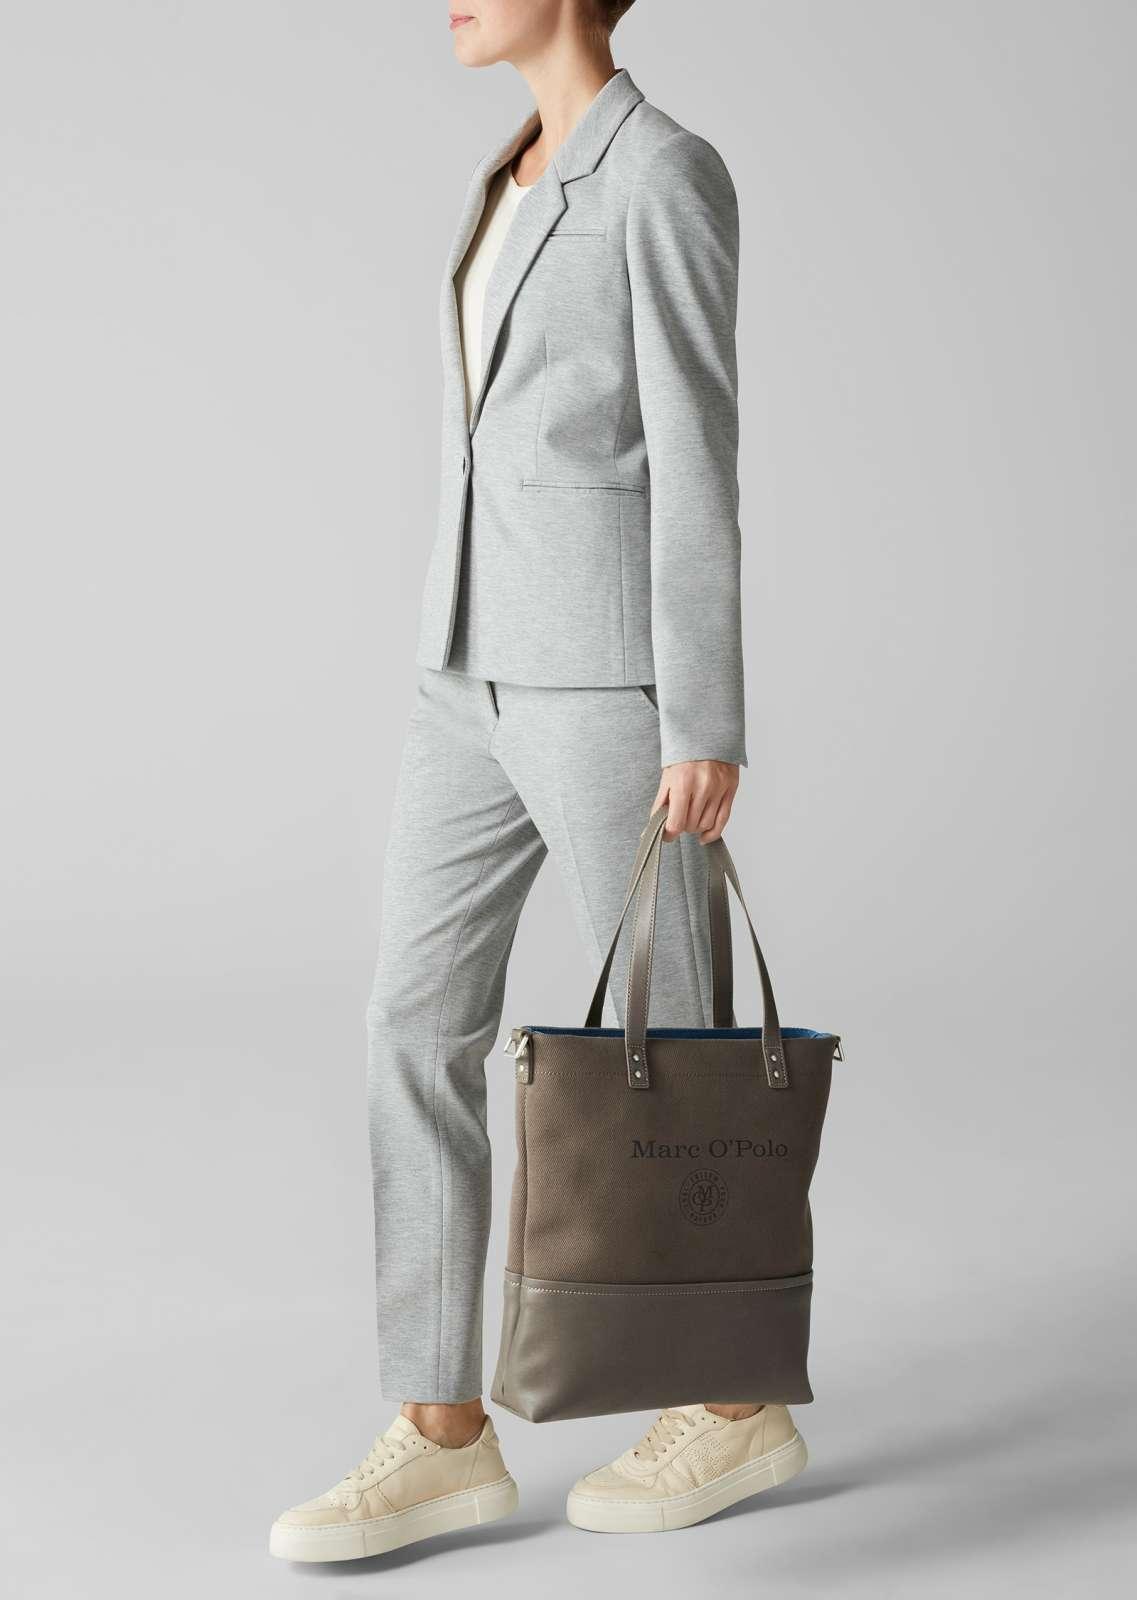 autumn shoes uk availability 100% genuine Marc O'Polo Ninetyeight Shopper Baumwolle